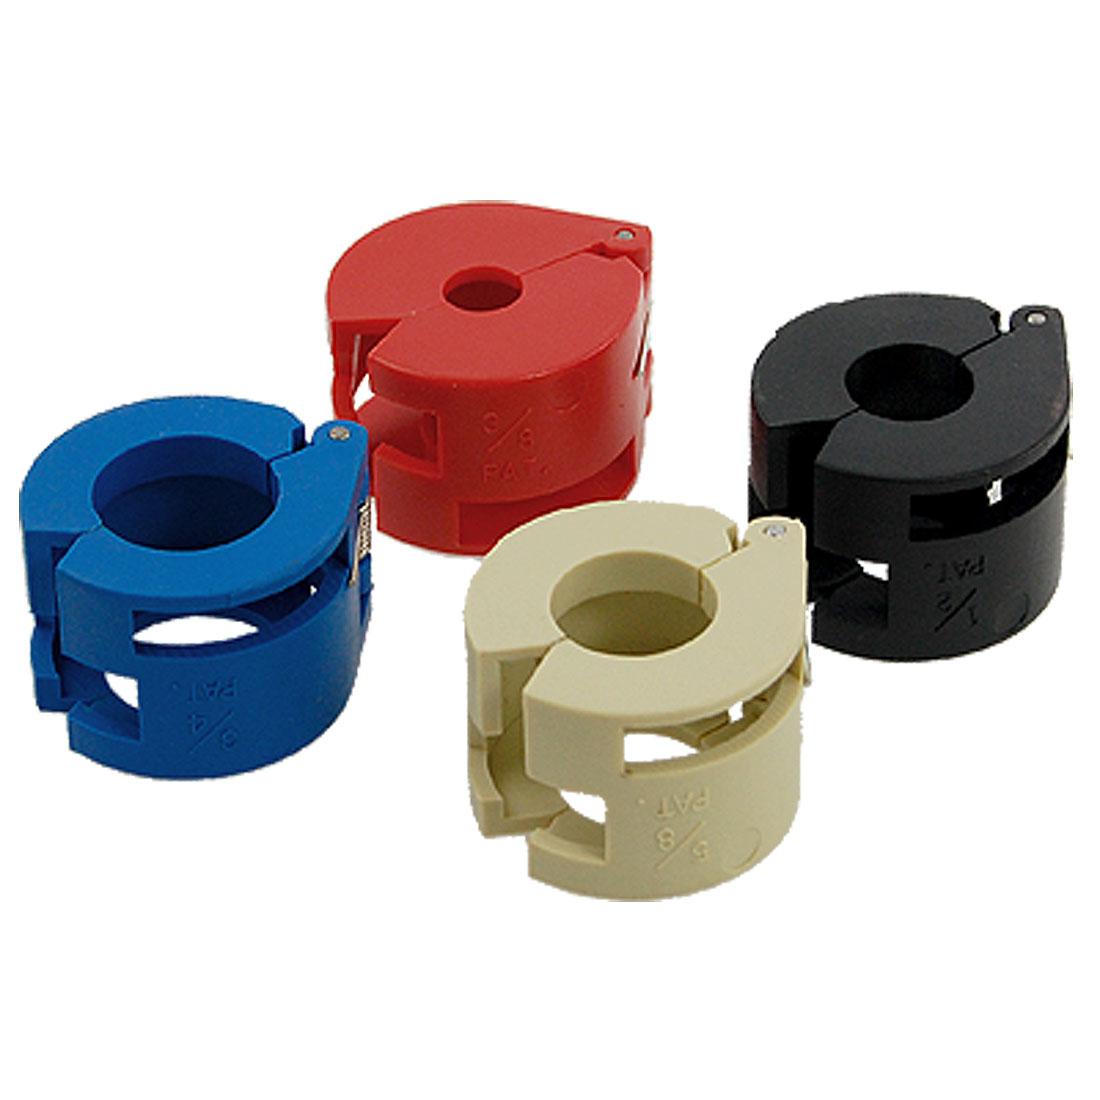 AC Fuel Line Plastic Spring Locking Coupling Tool 4 Pcs